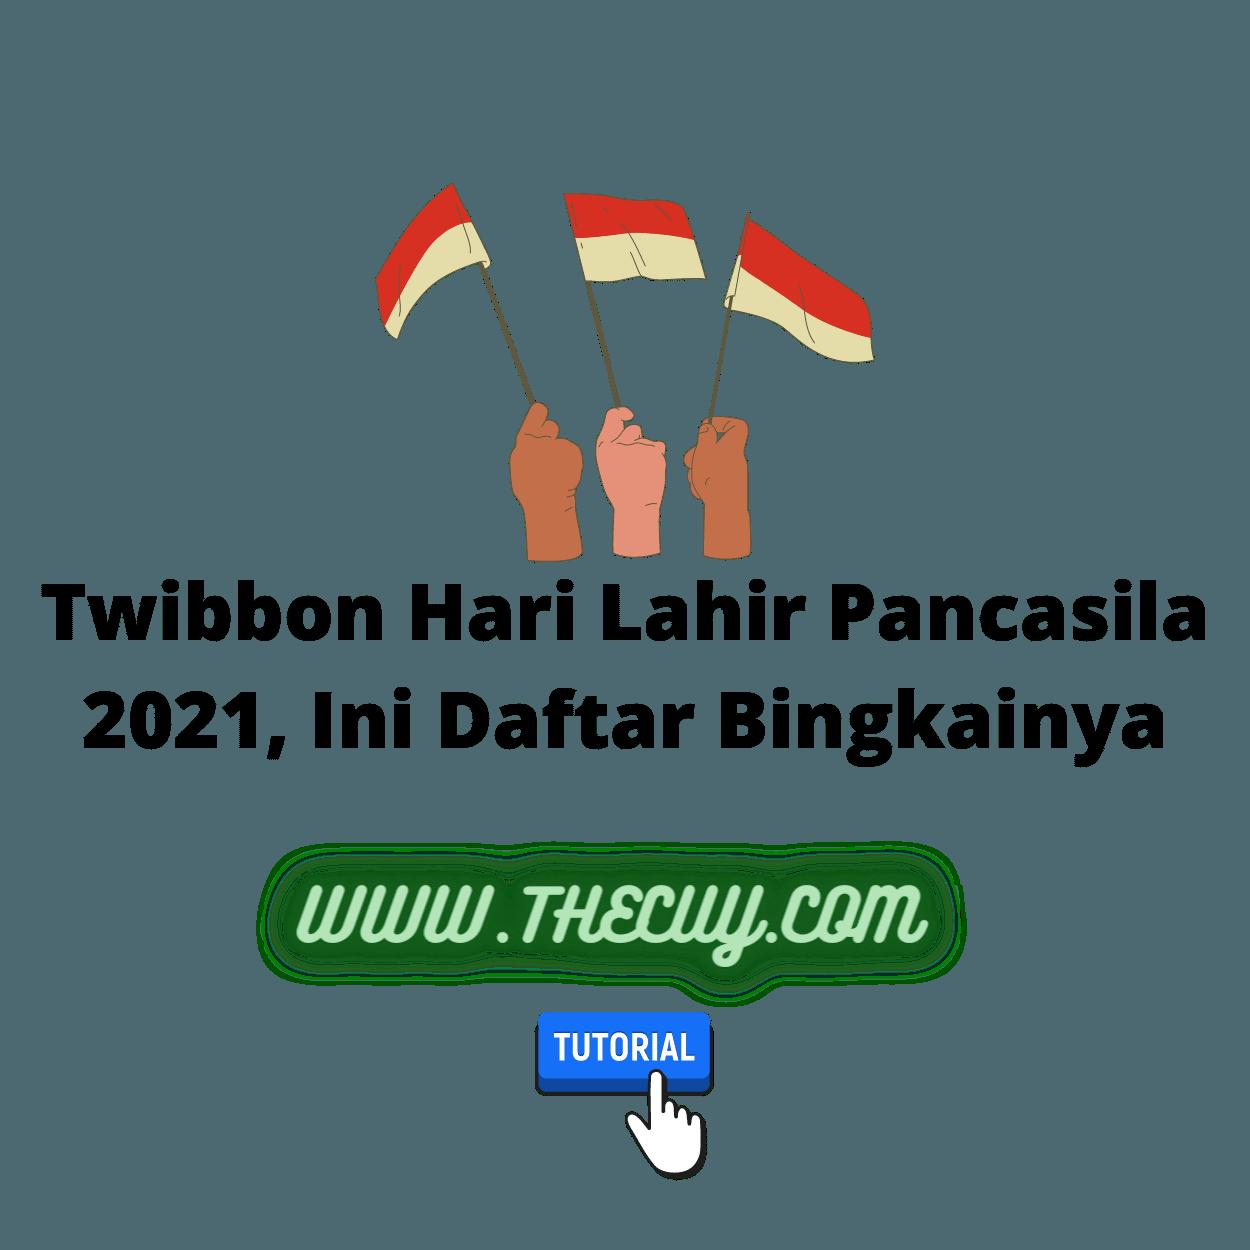 Twibbon Hari Lahir Pancasila 2021, Ini Daftar Bingkainya